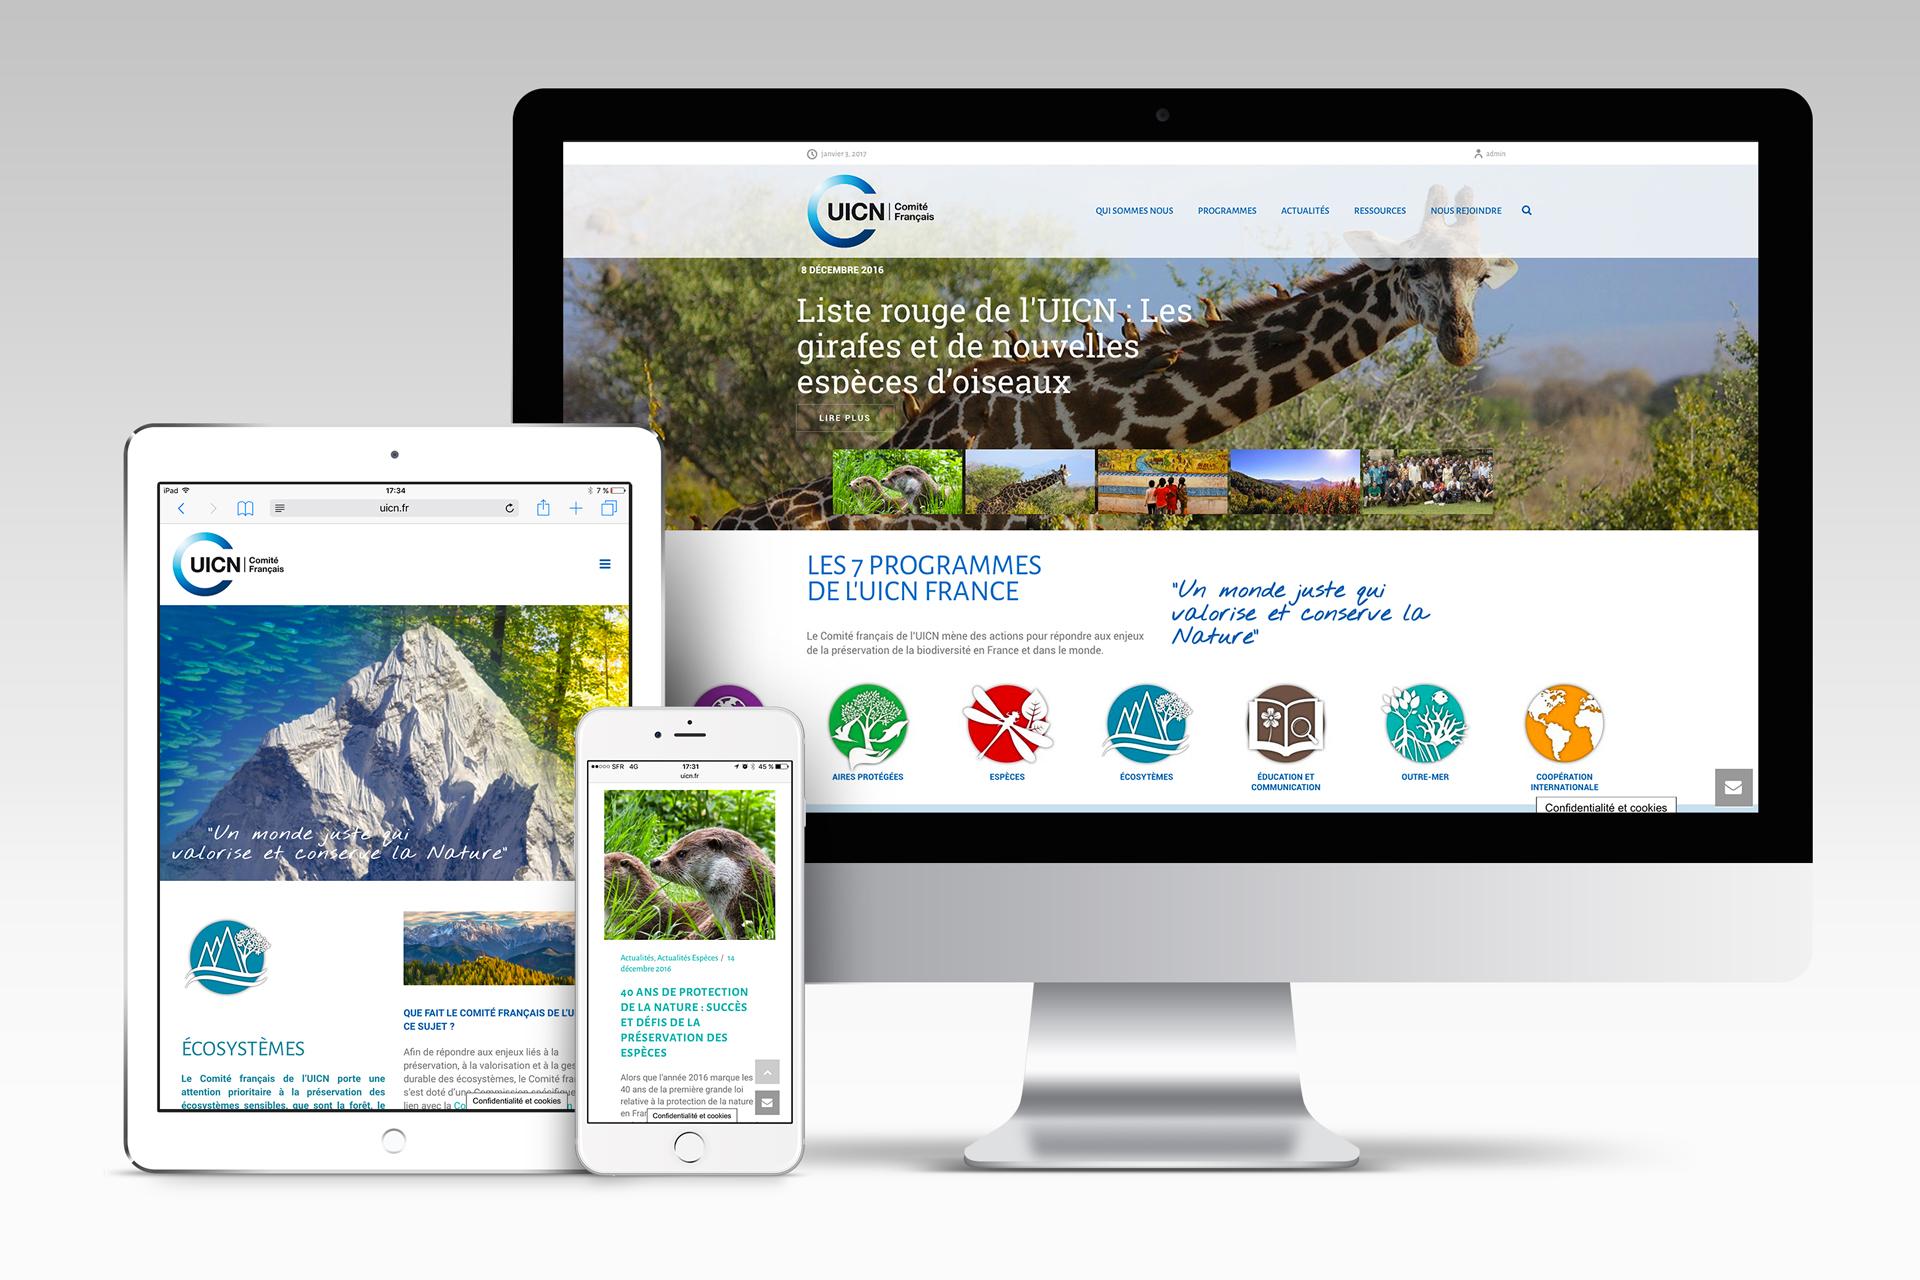 UICN siteweb